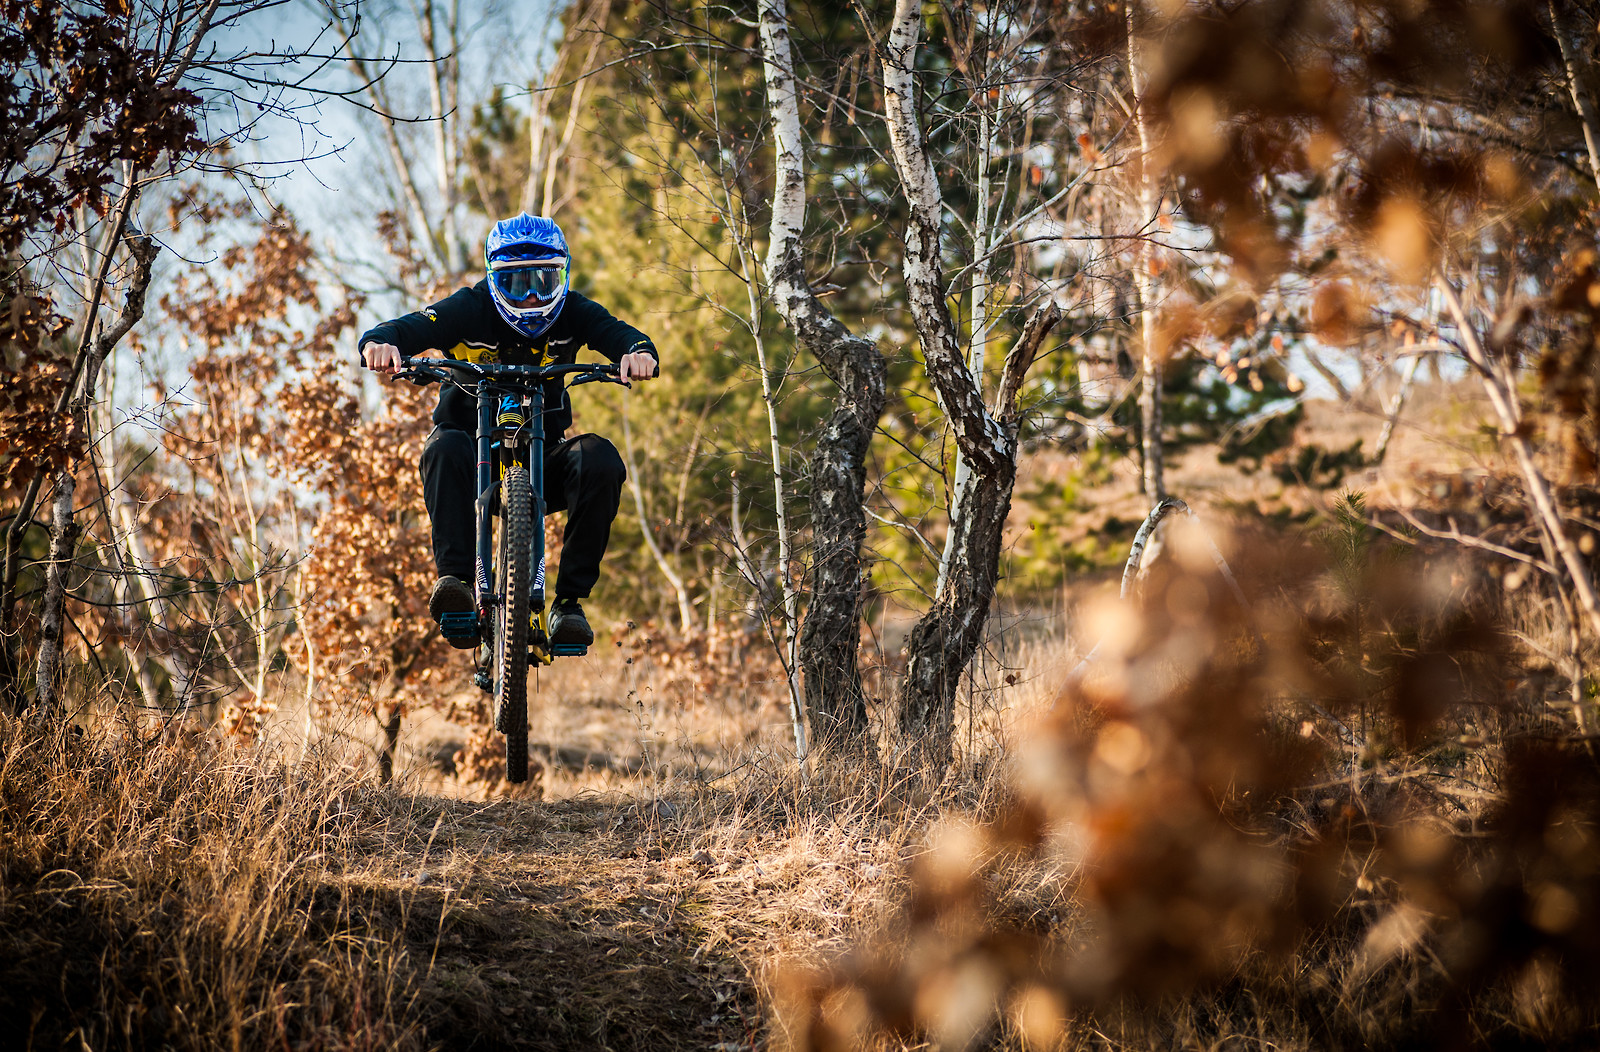 brezacik - purehell - Mountain Biking Pictures - Vital MTB